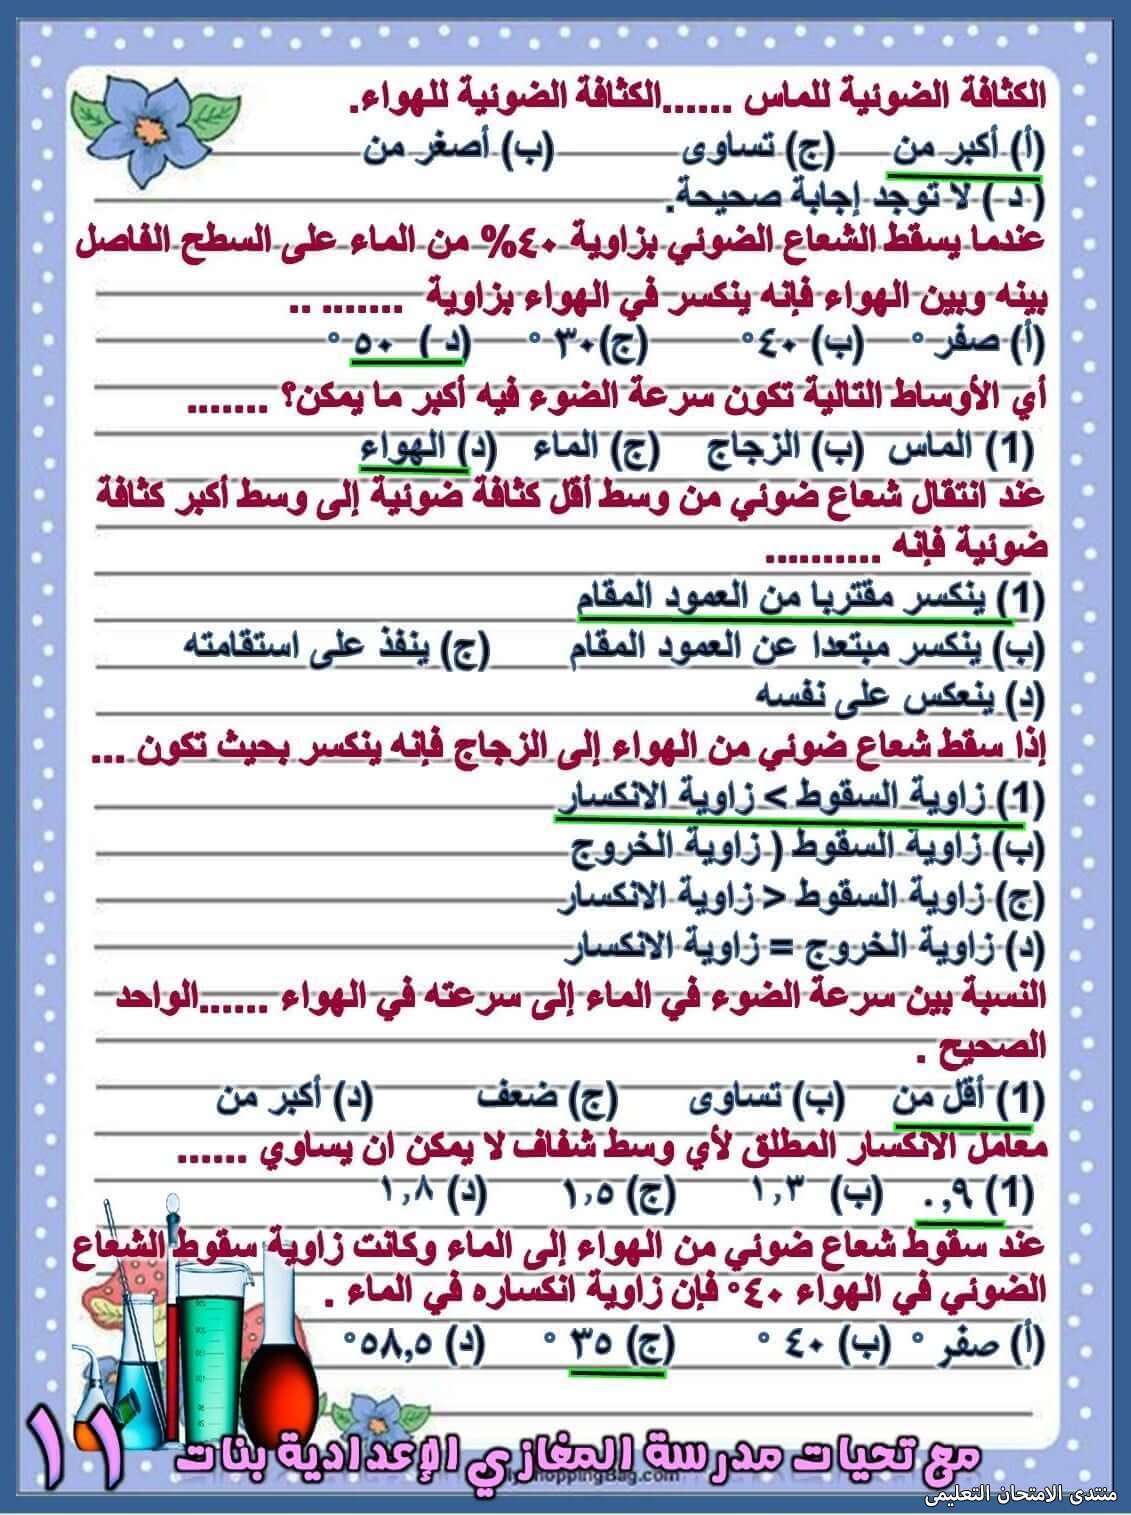 exam-eg.com_1618273750880411.jpg